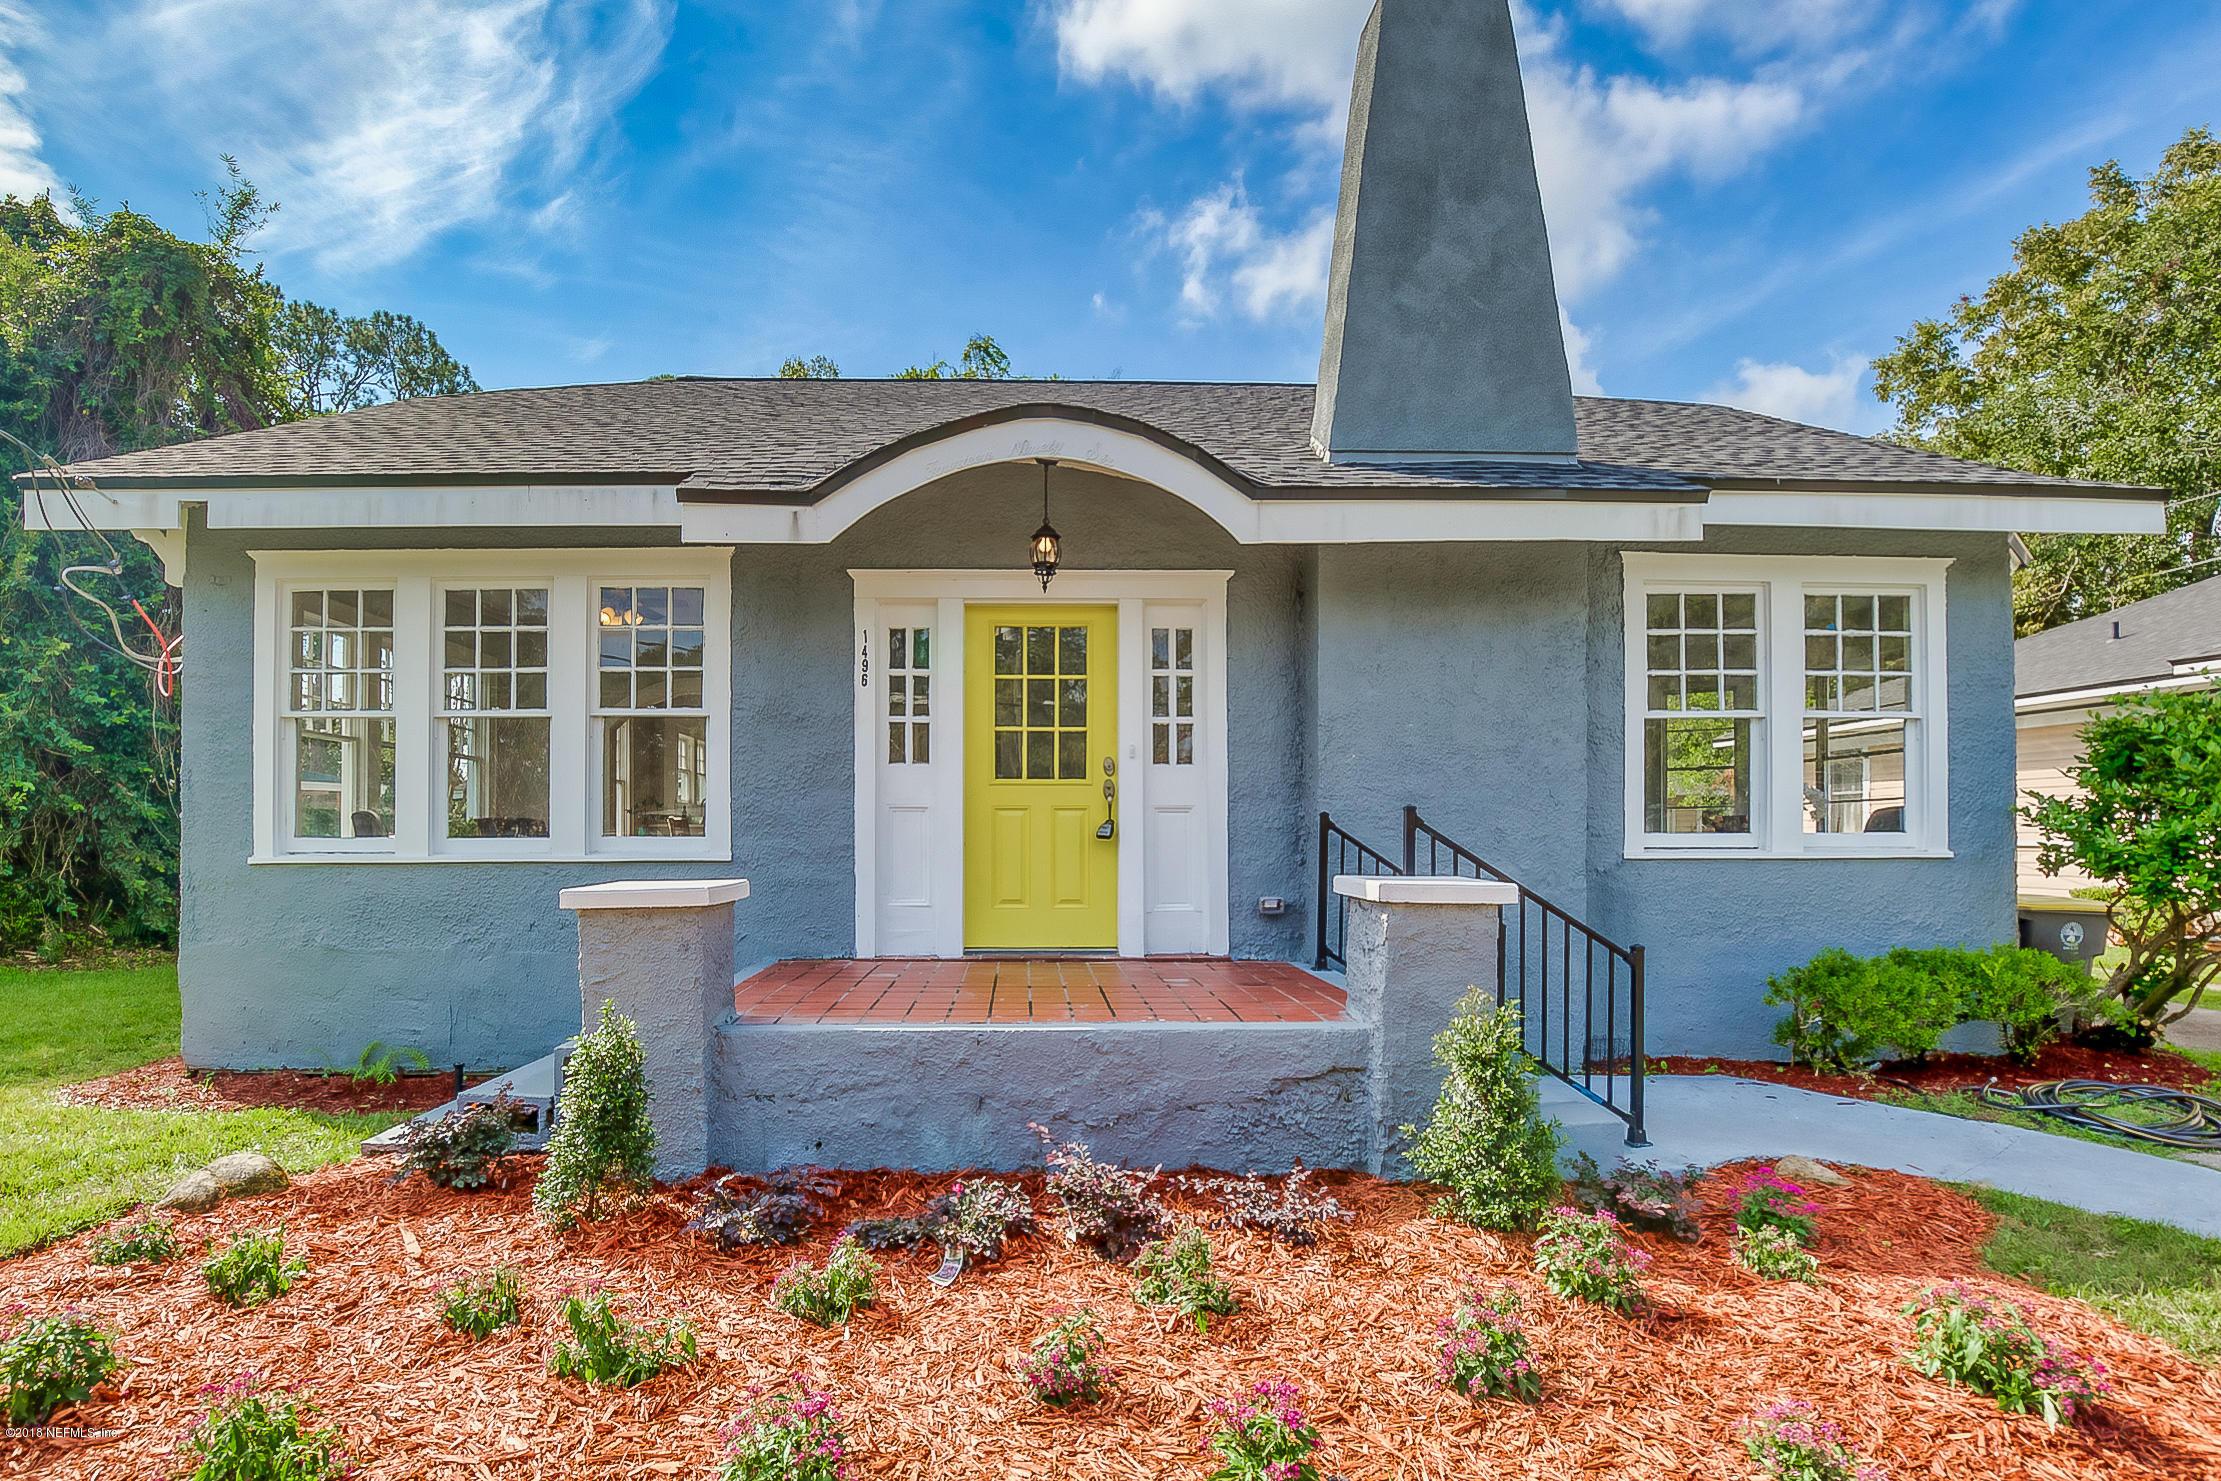 1496 CHALLEN, JACKSONVILLE, FLORIDA 32205, 4 Bedrooms Bedrooms, ,2 BathroomsBathrooms,Residential - single family,For sale,CHALLEN,966448